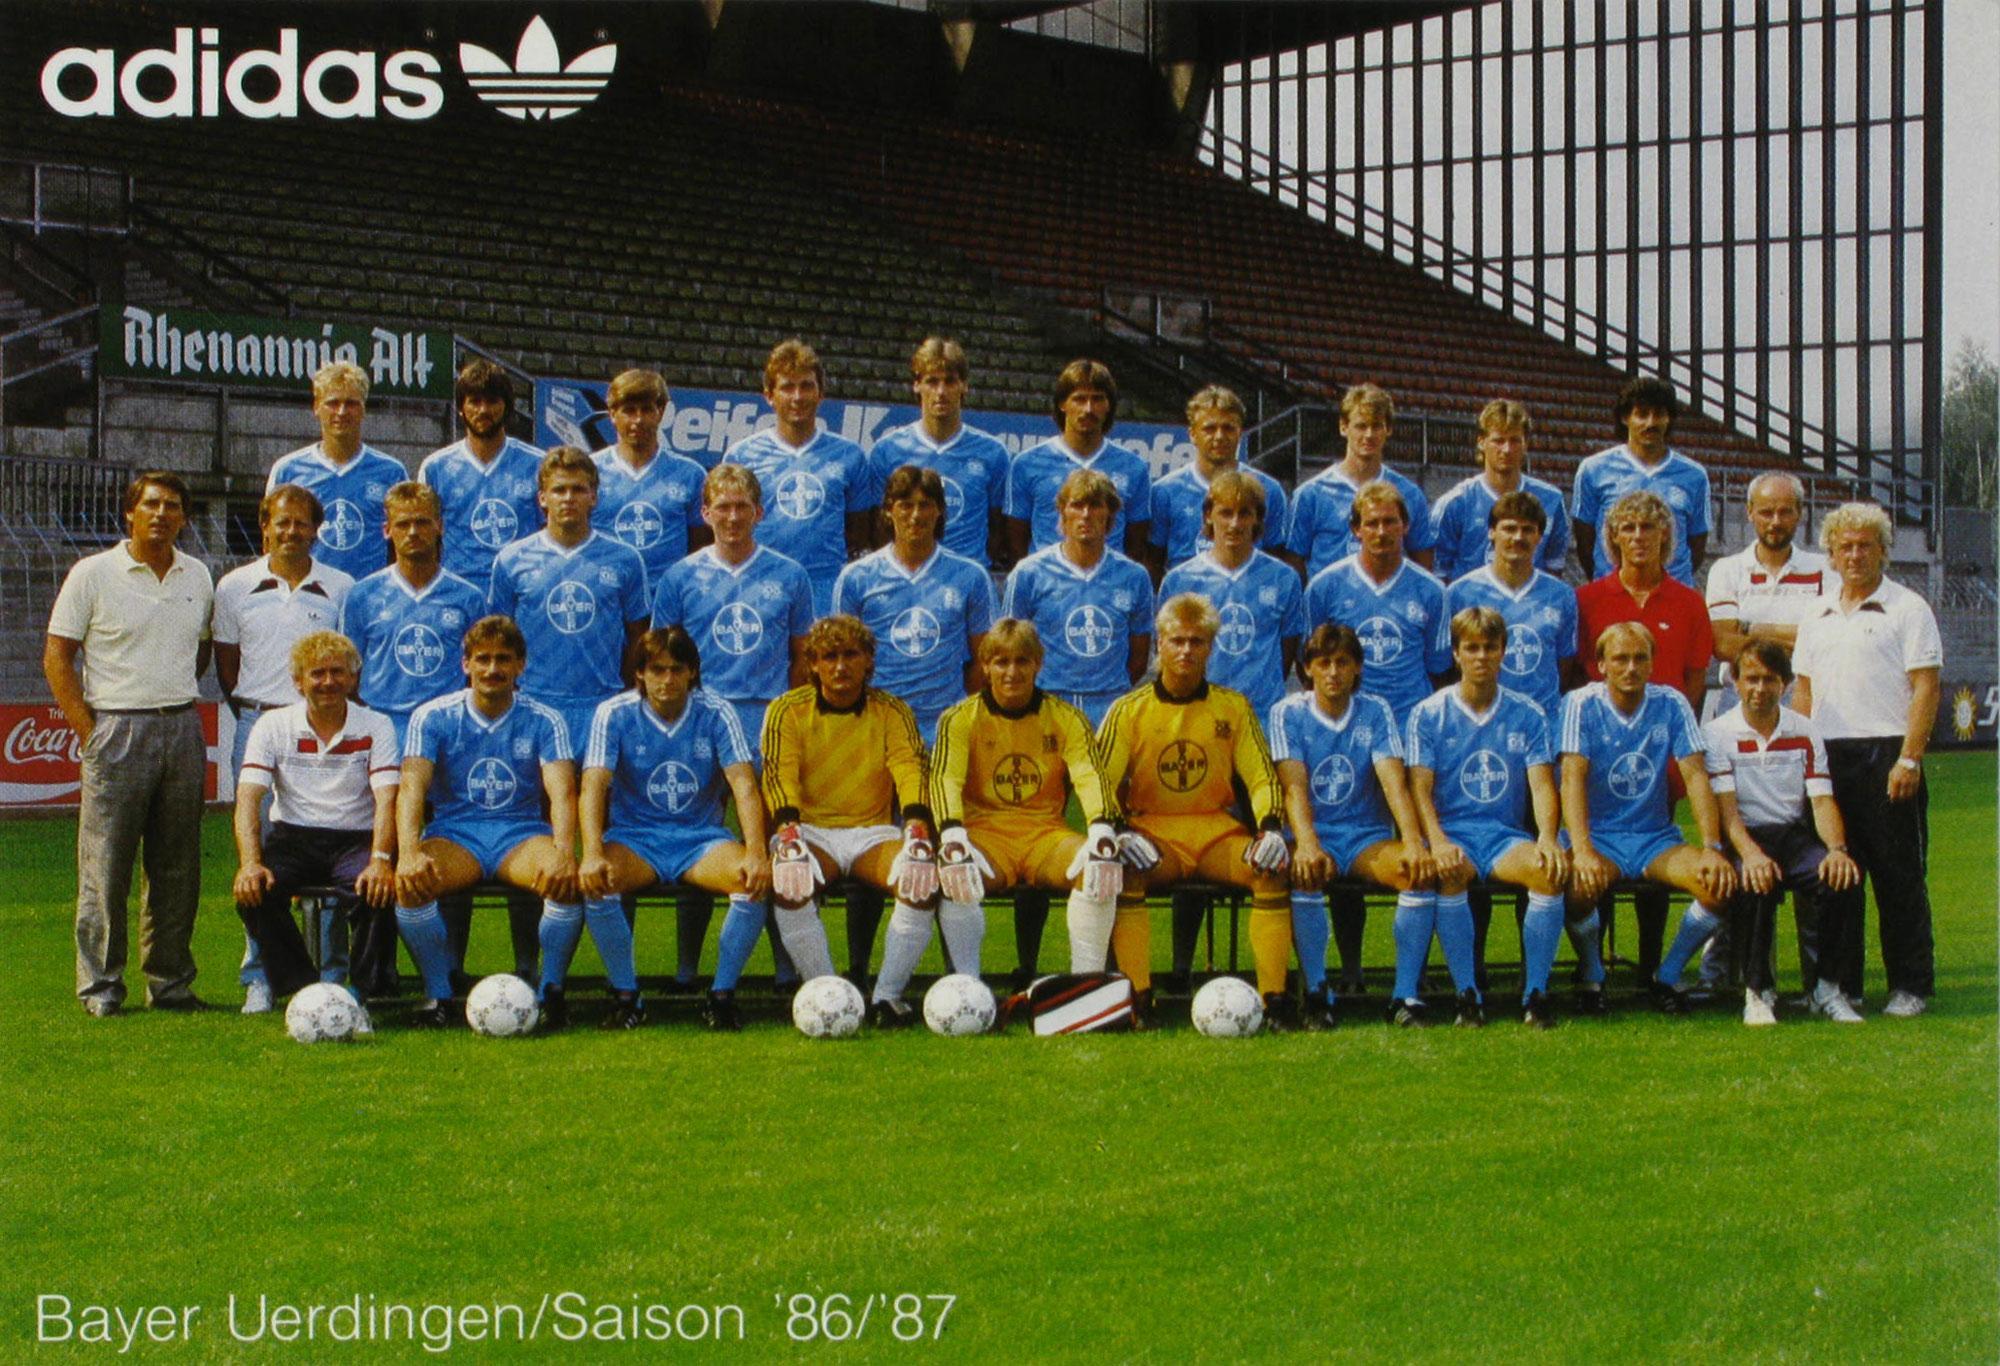 Mannschaftsbild Saison 86/87